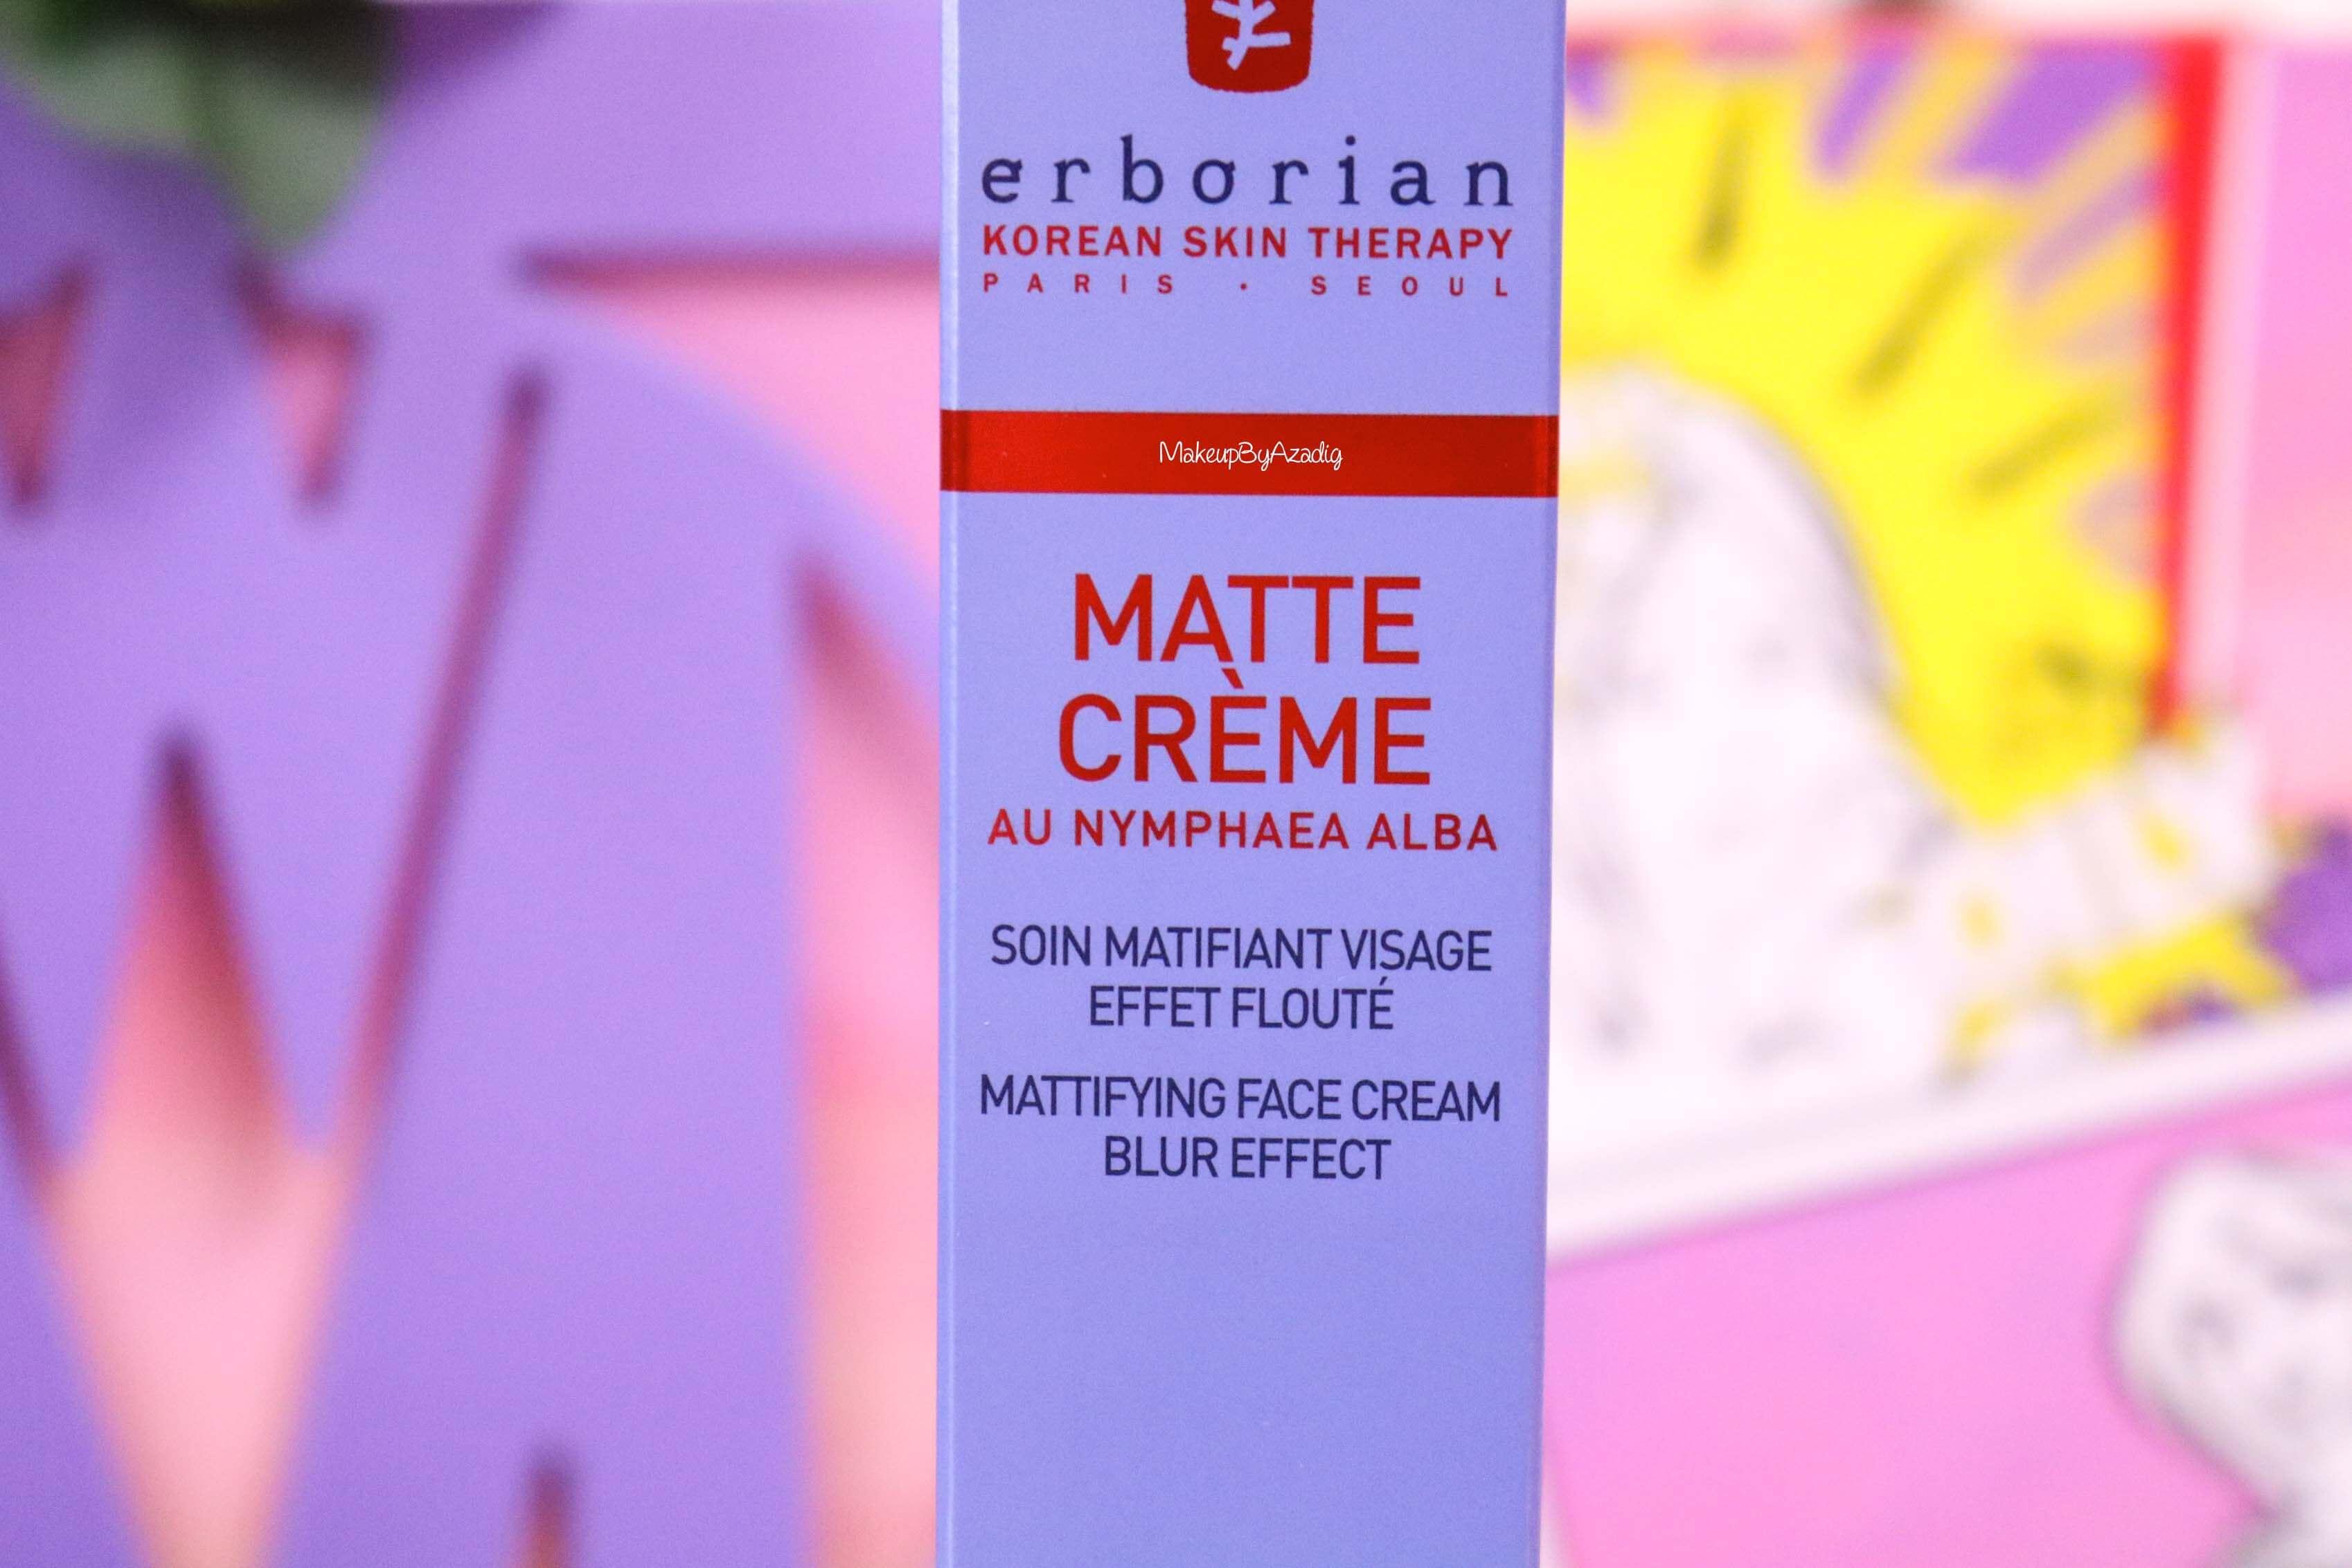 revue-matte-creme-matifiant-floute-erborian-prix-avis-makeupbyazadig-nouveaute-sephora-zoom